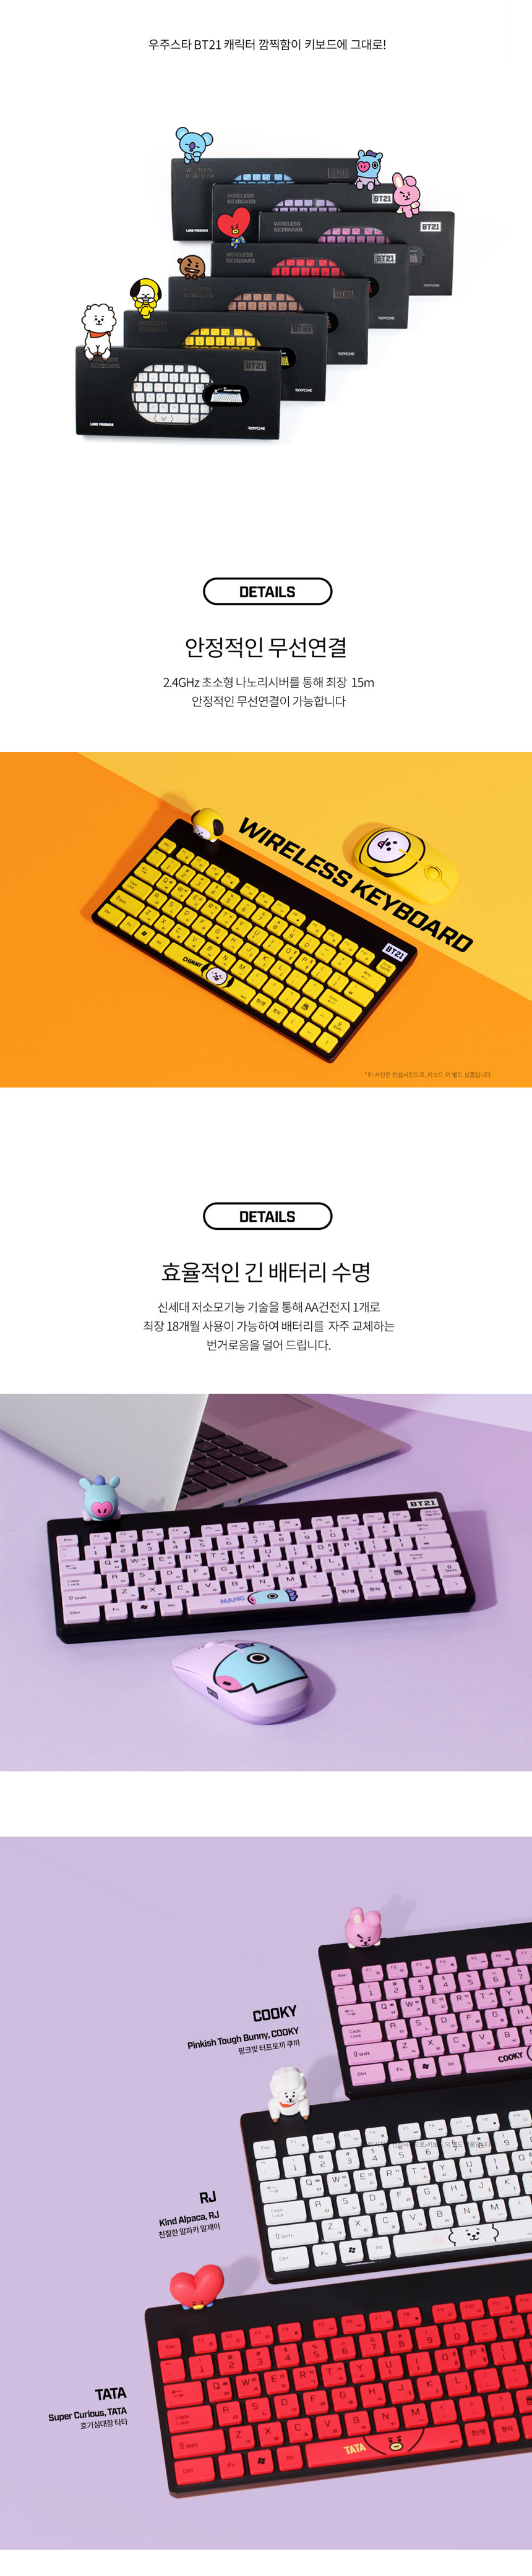 bt21_gm_keyboard_02.jpg